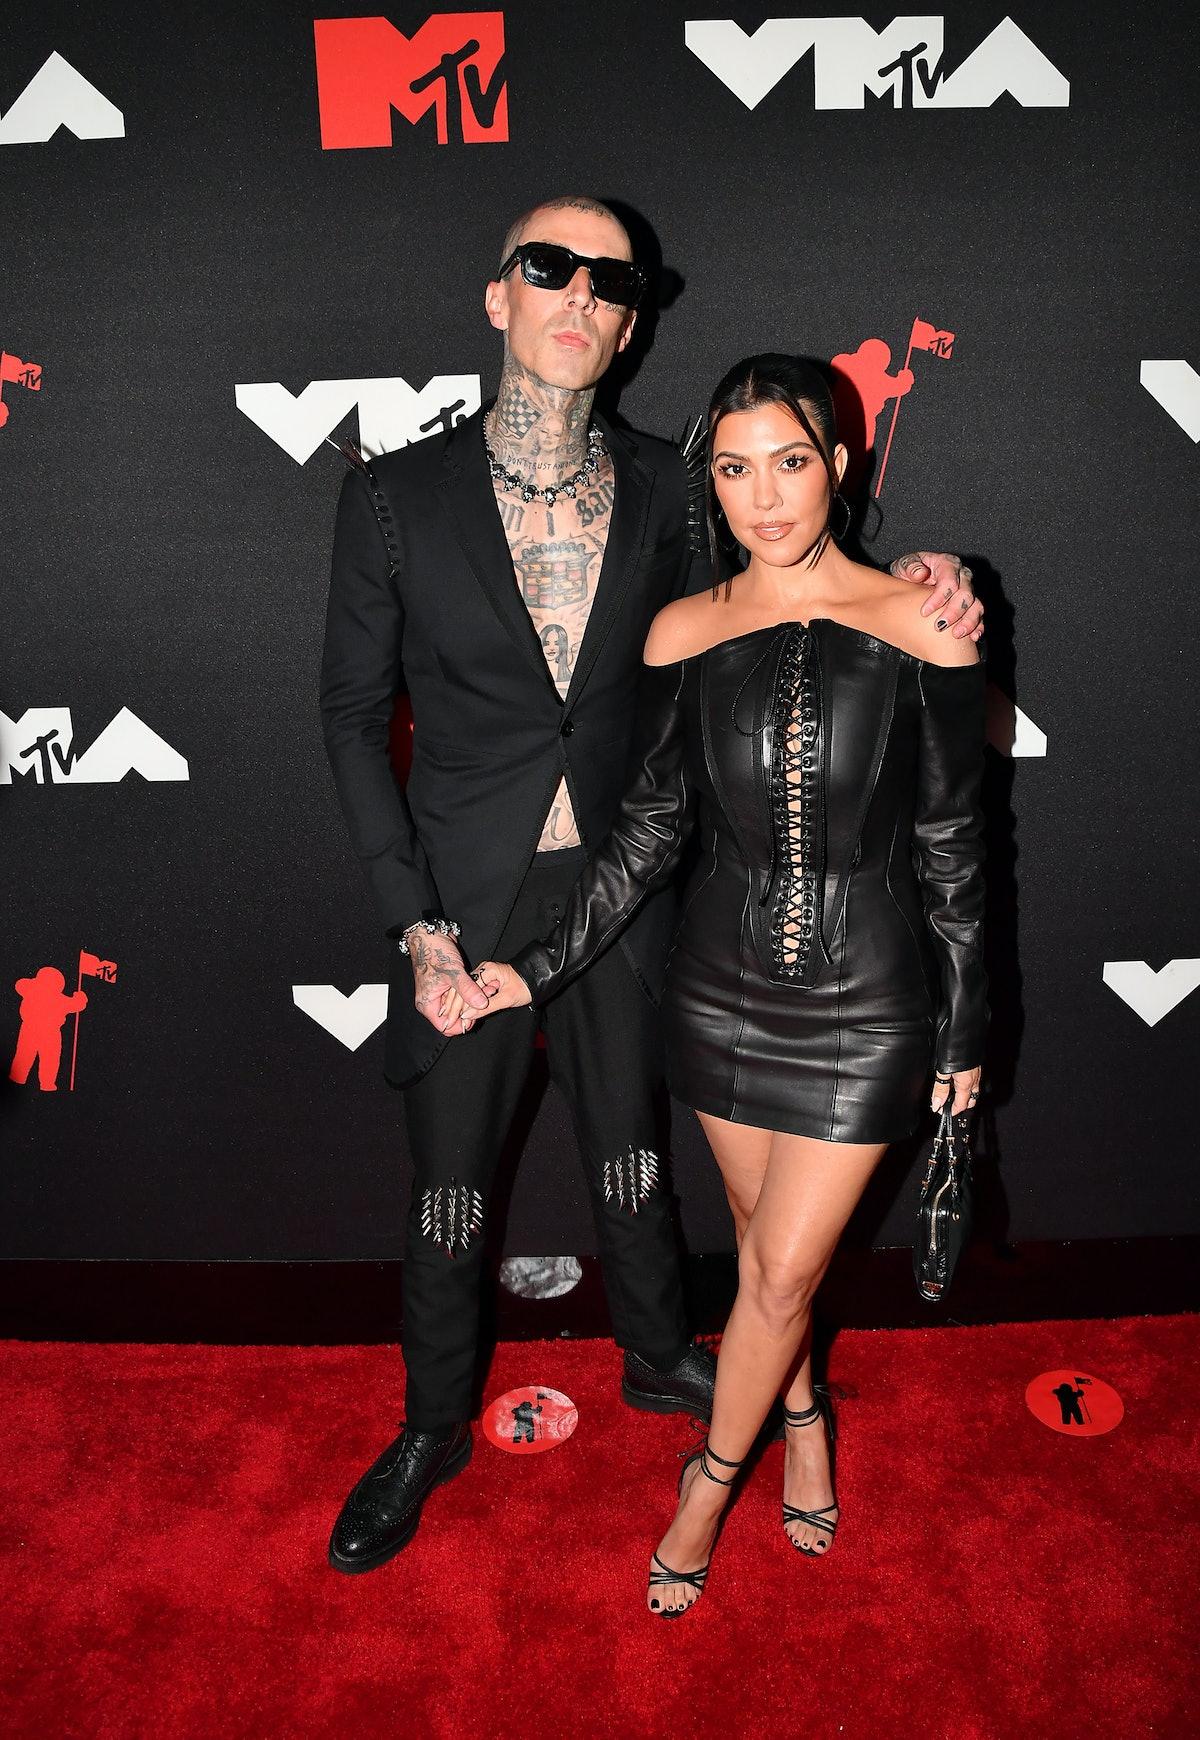 Travis Barker and Kourtney Kardashian attends the 2021 MTV Video Music Awards at Barclays Center on ...